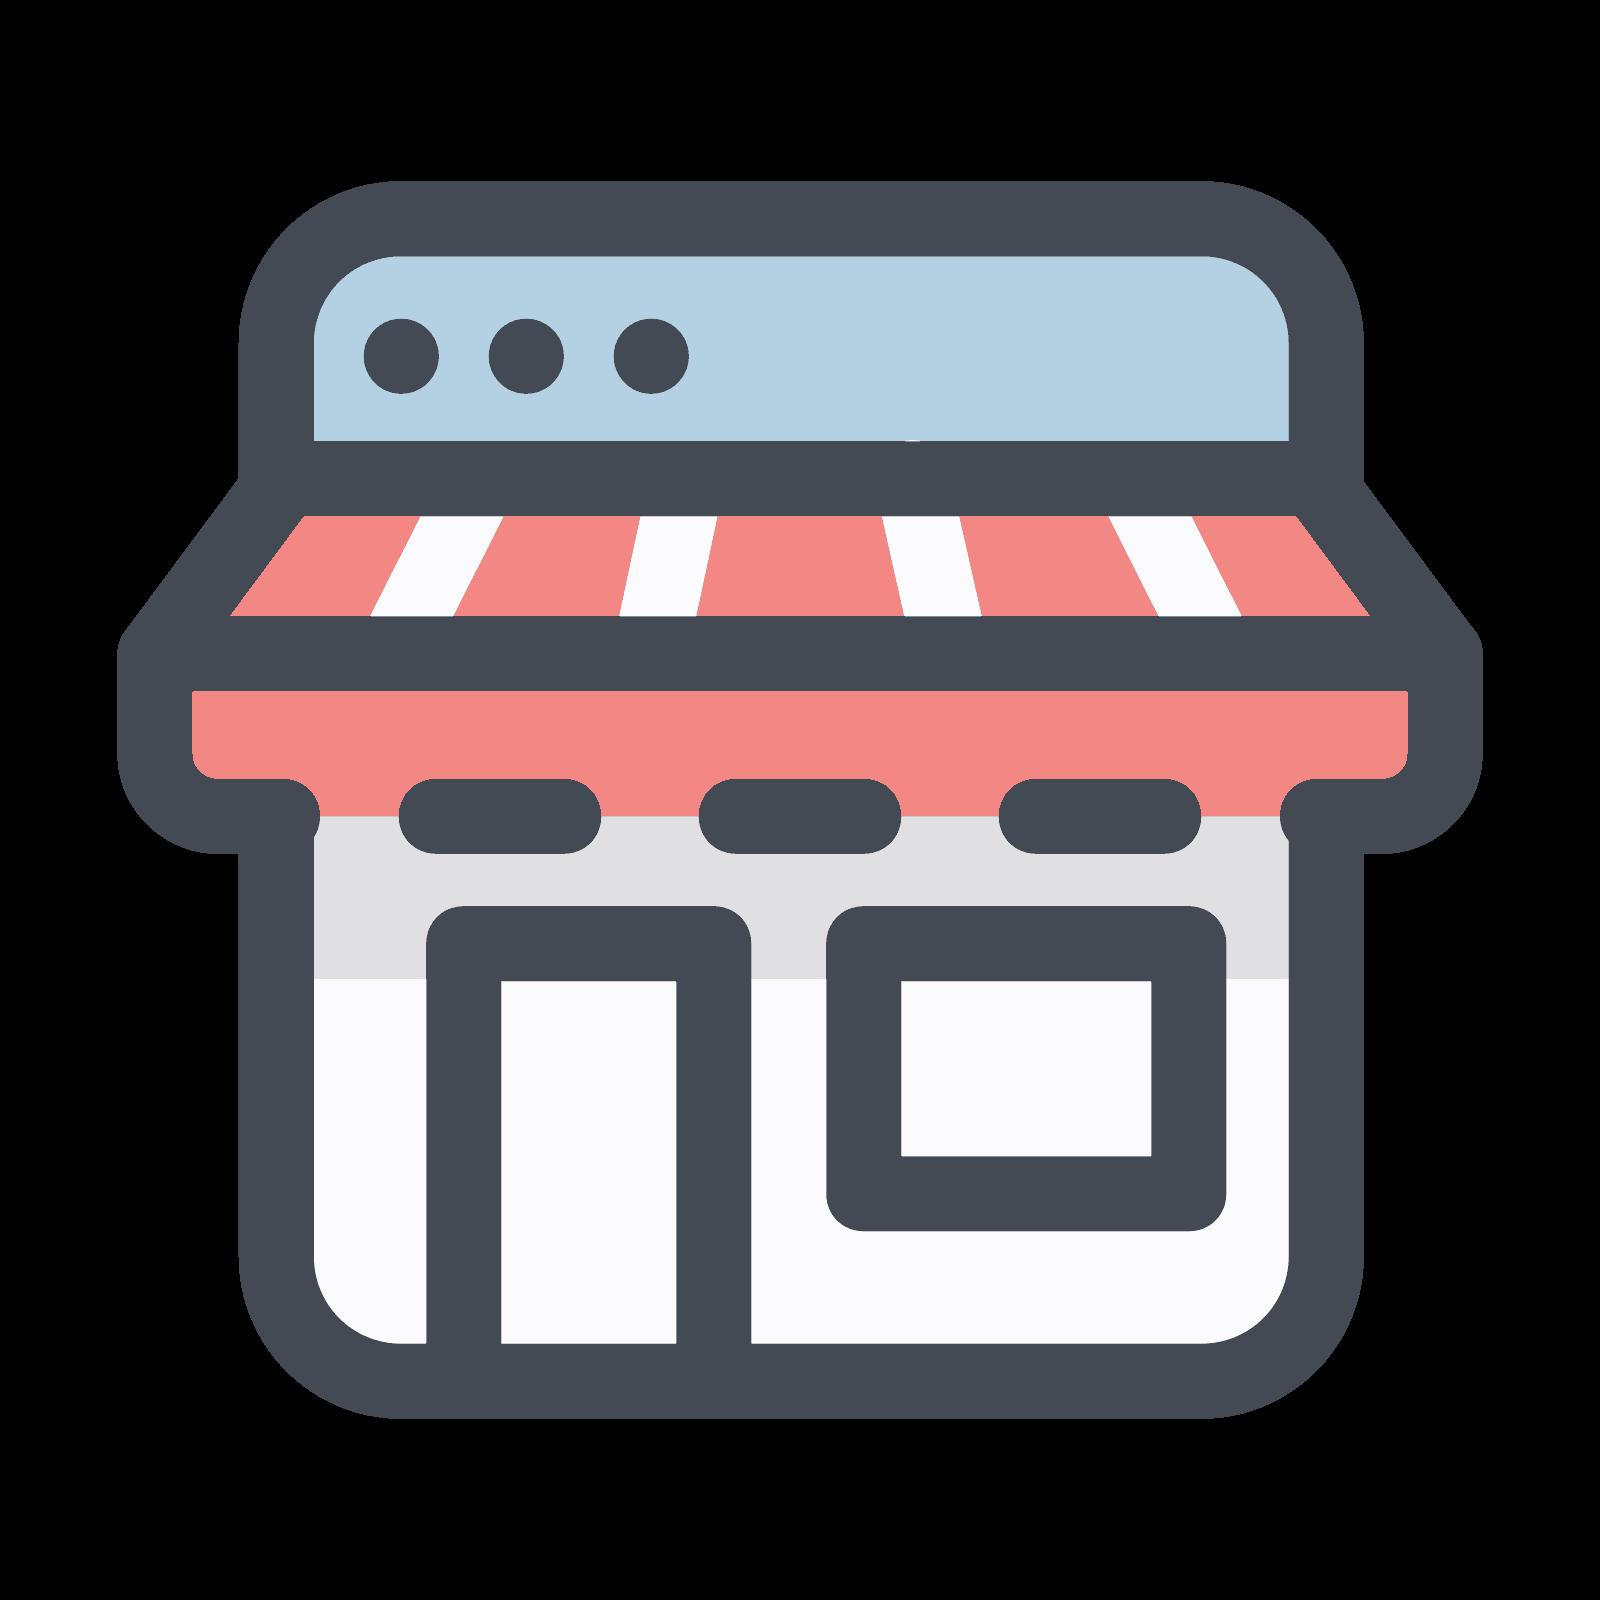 VirtualStore - החנות הוירטואלית שלי